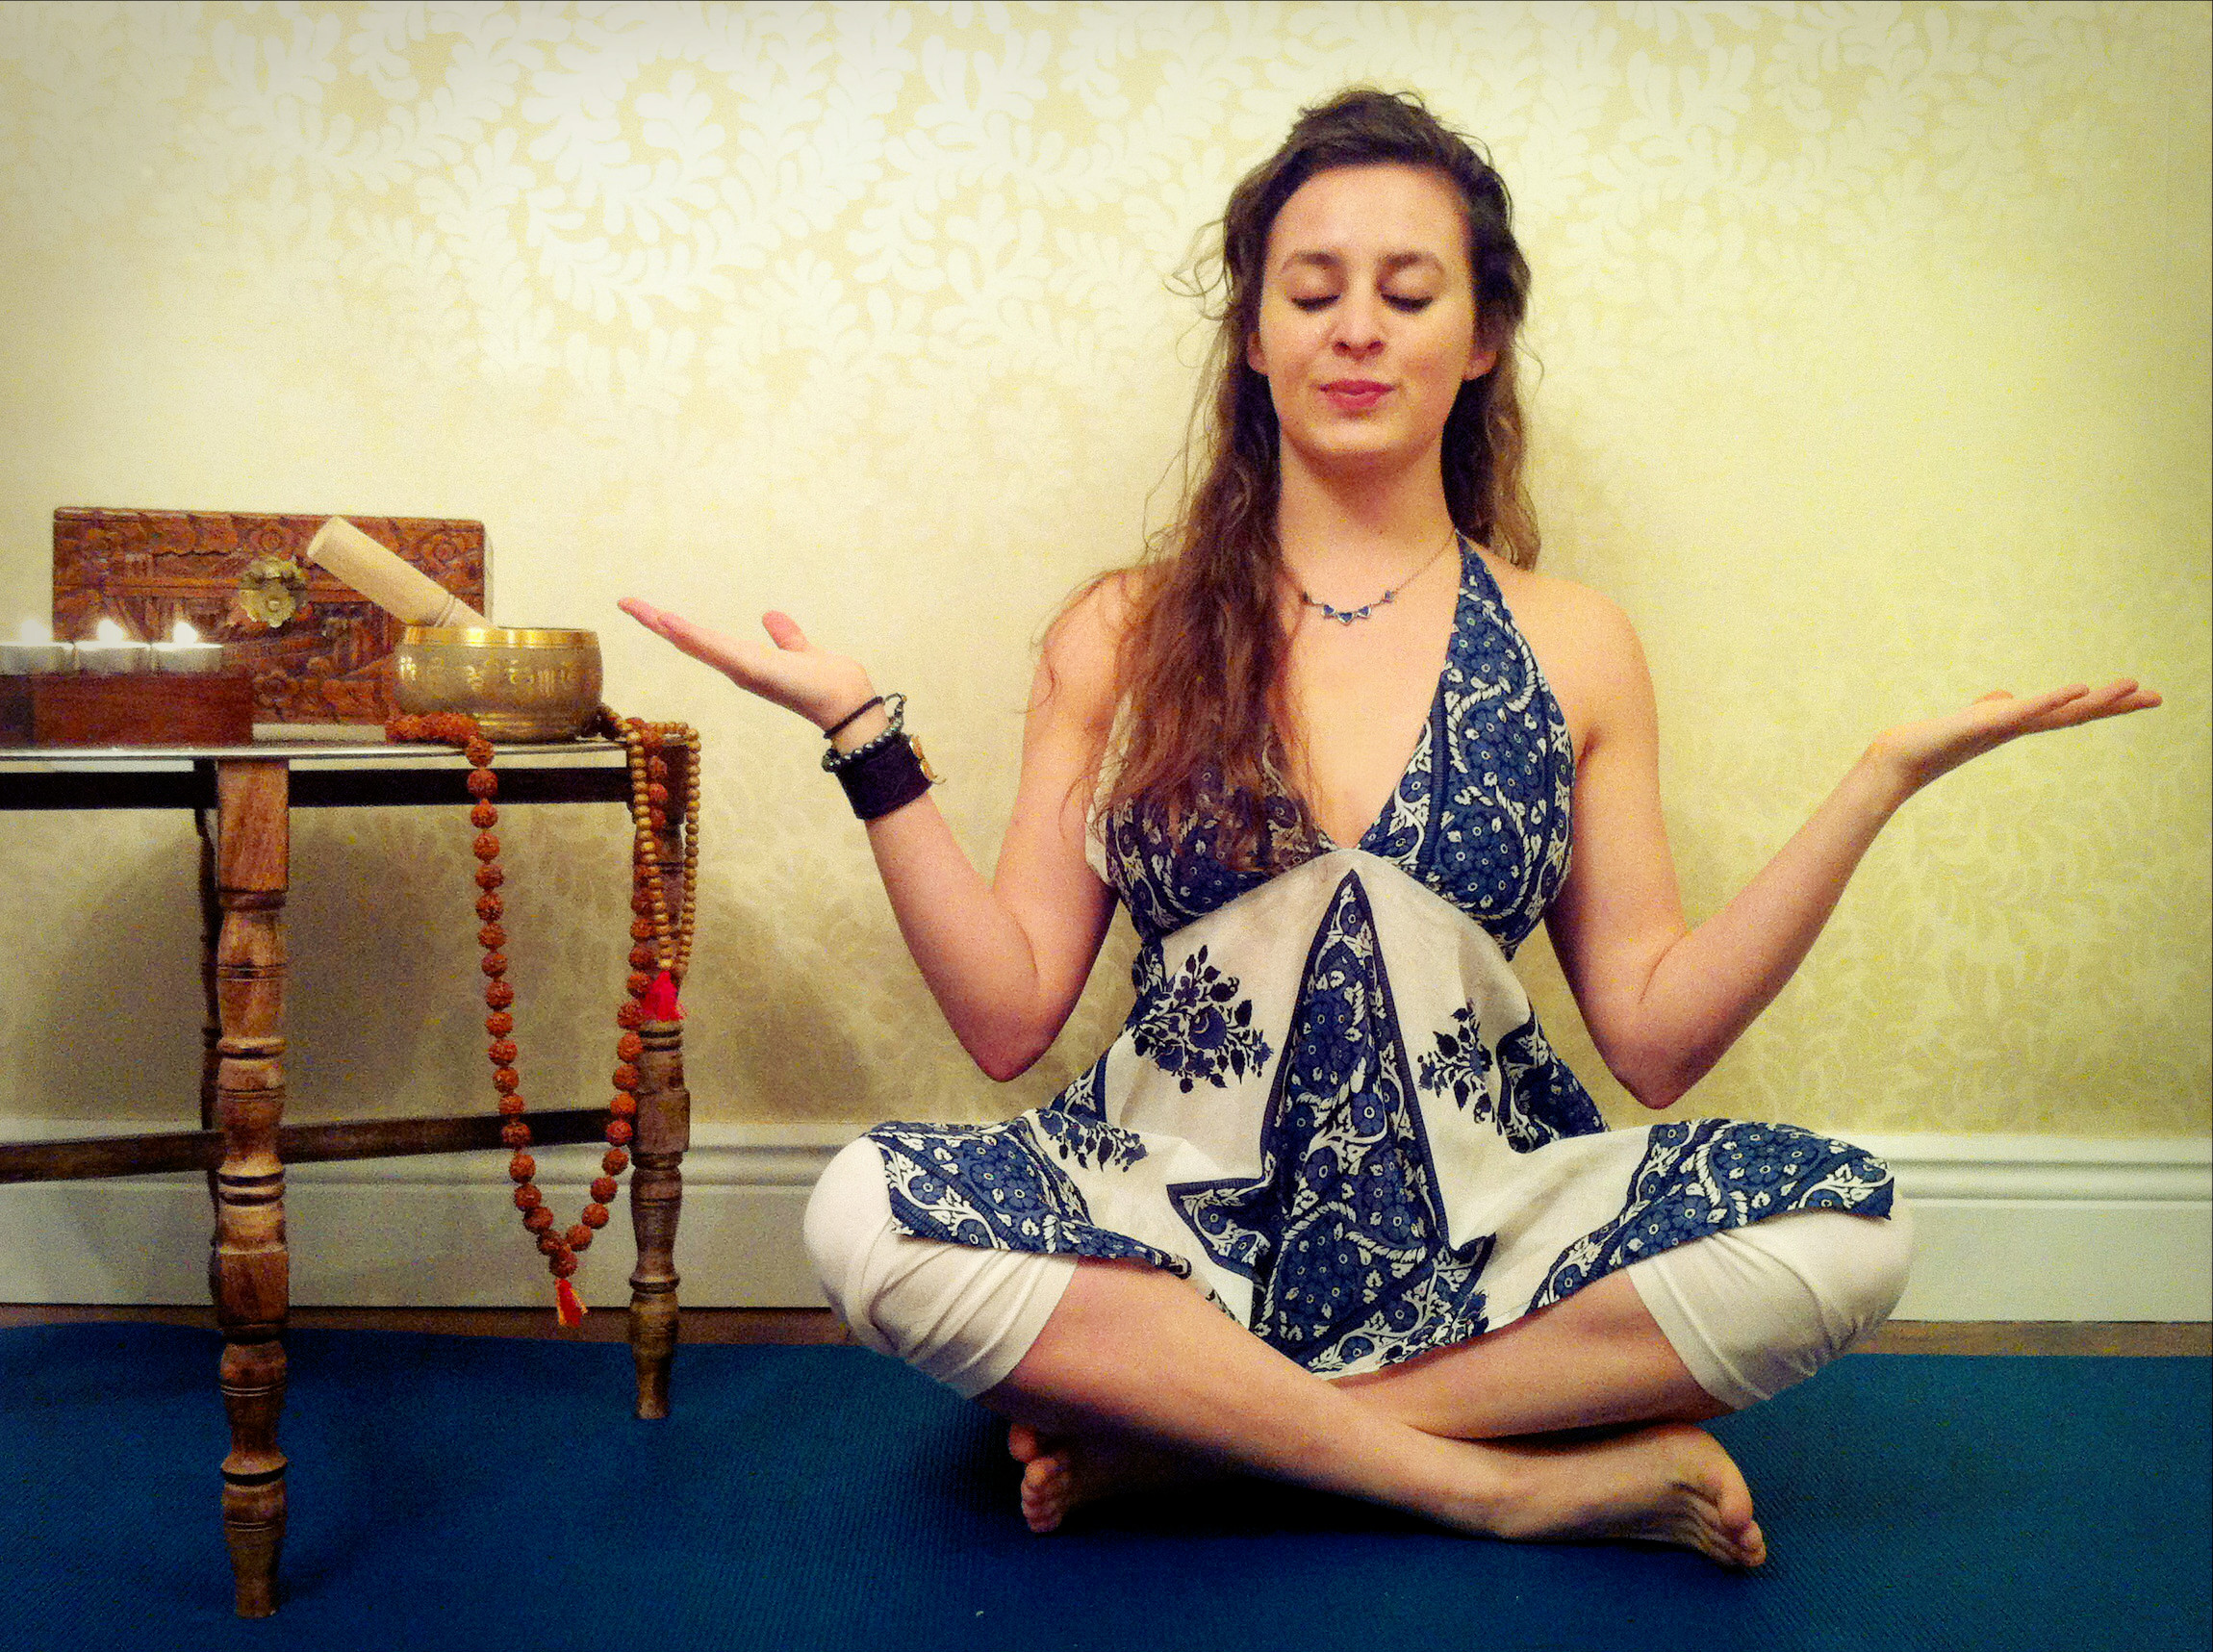 Sankalpa Mudra: Seal Your New Year's Resolution